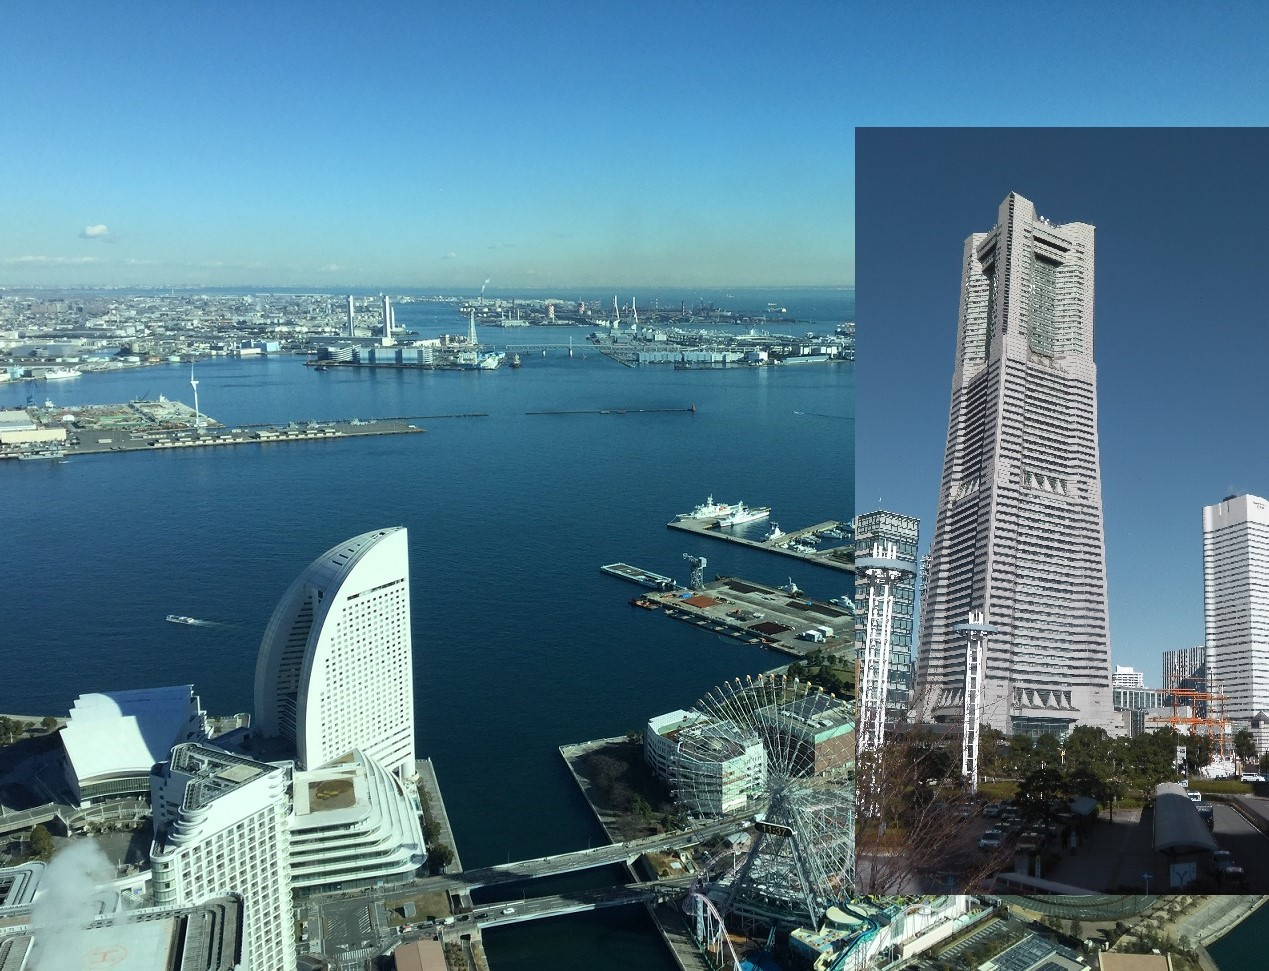 Landmark Tower, 300 m tall with great view of Yokohama Bay